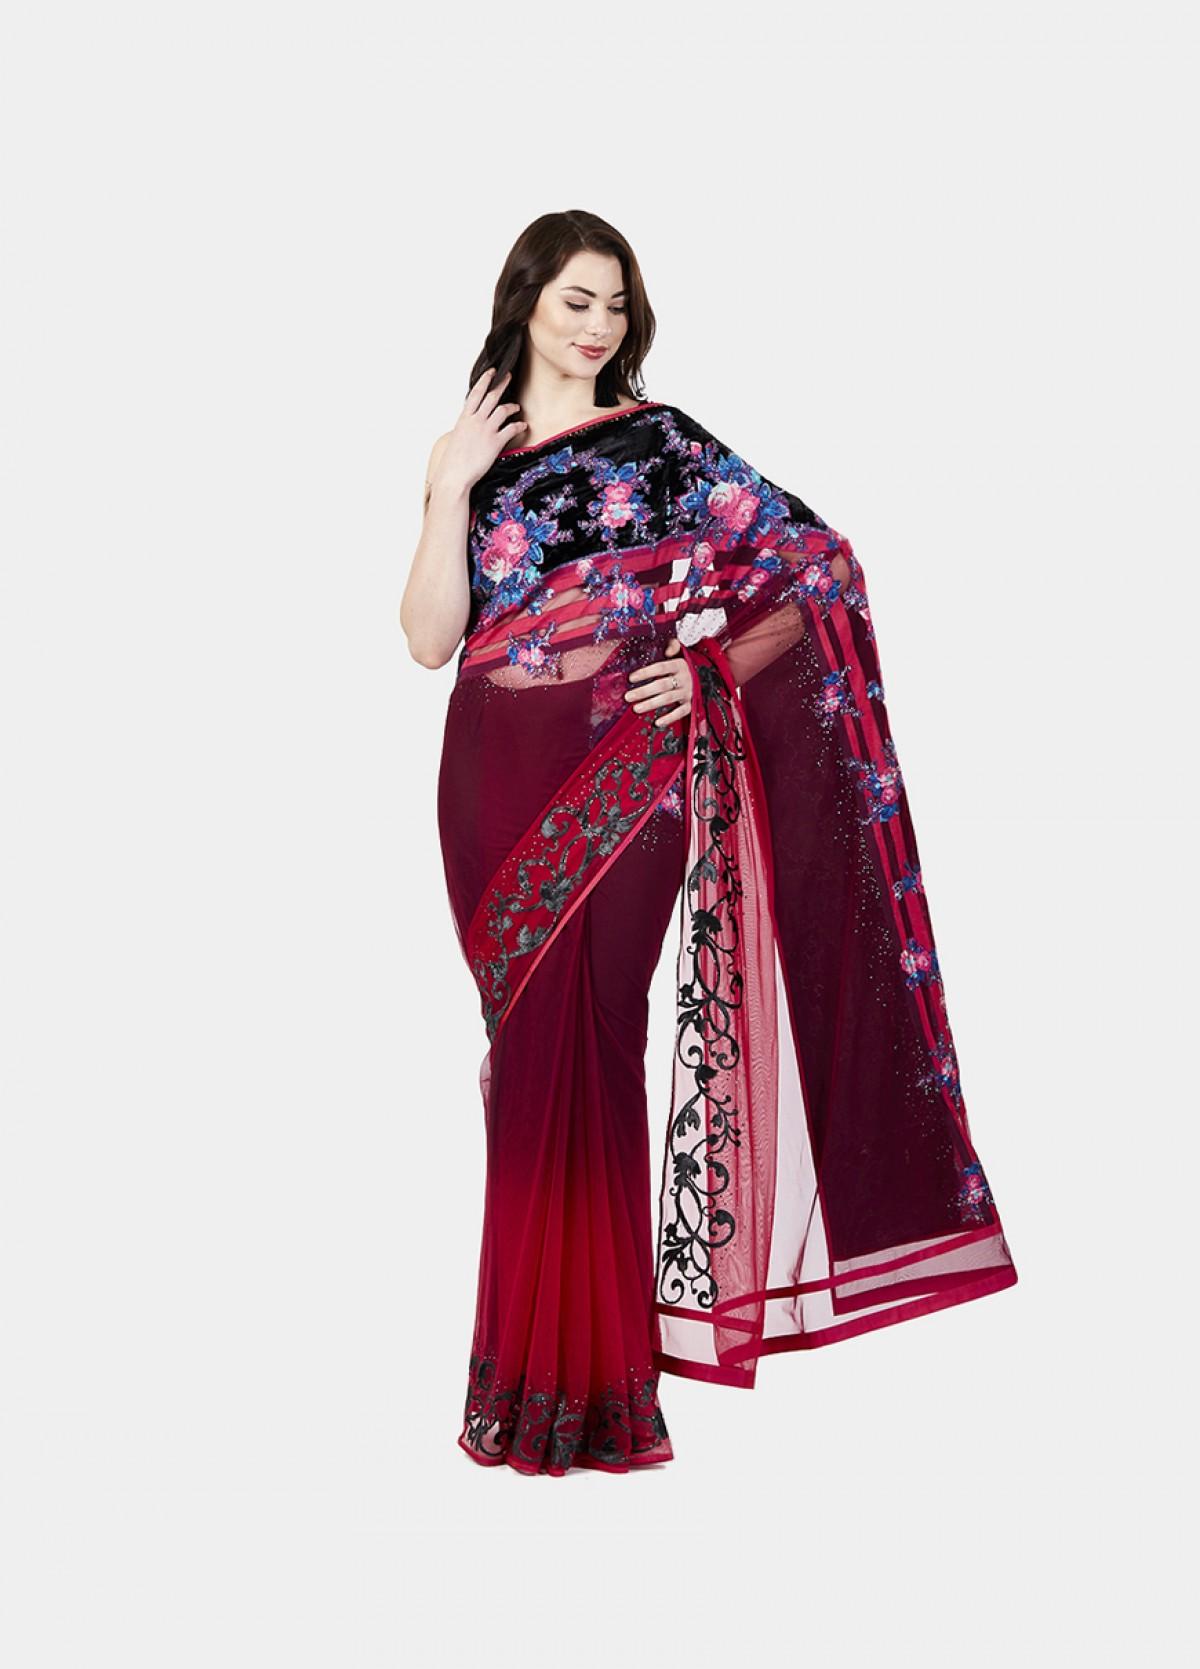 The Net Wine Embroidered Sari